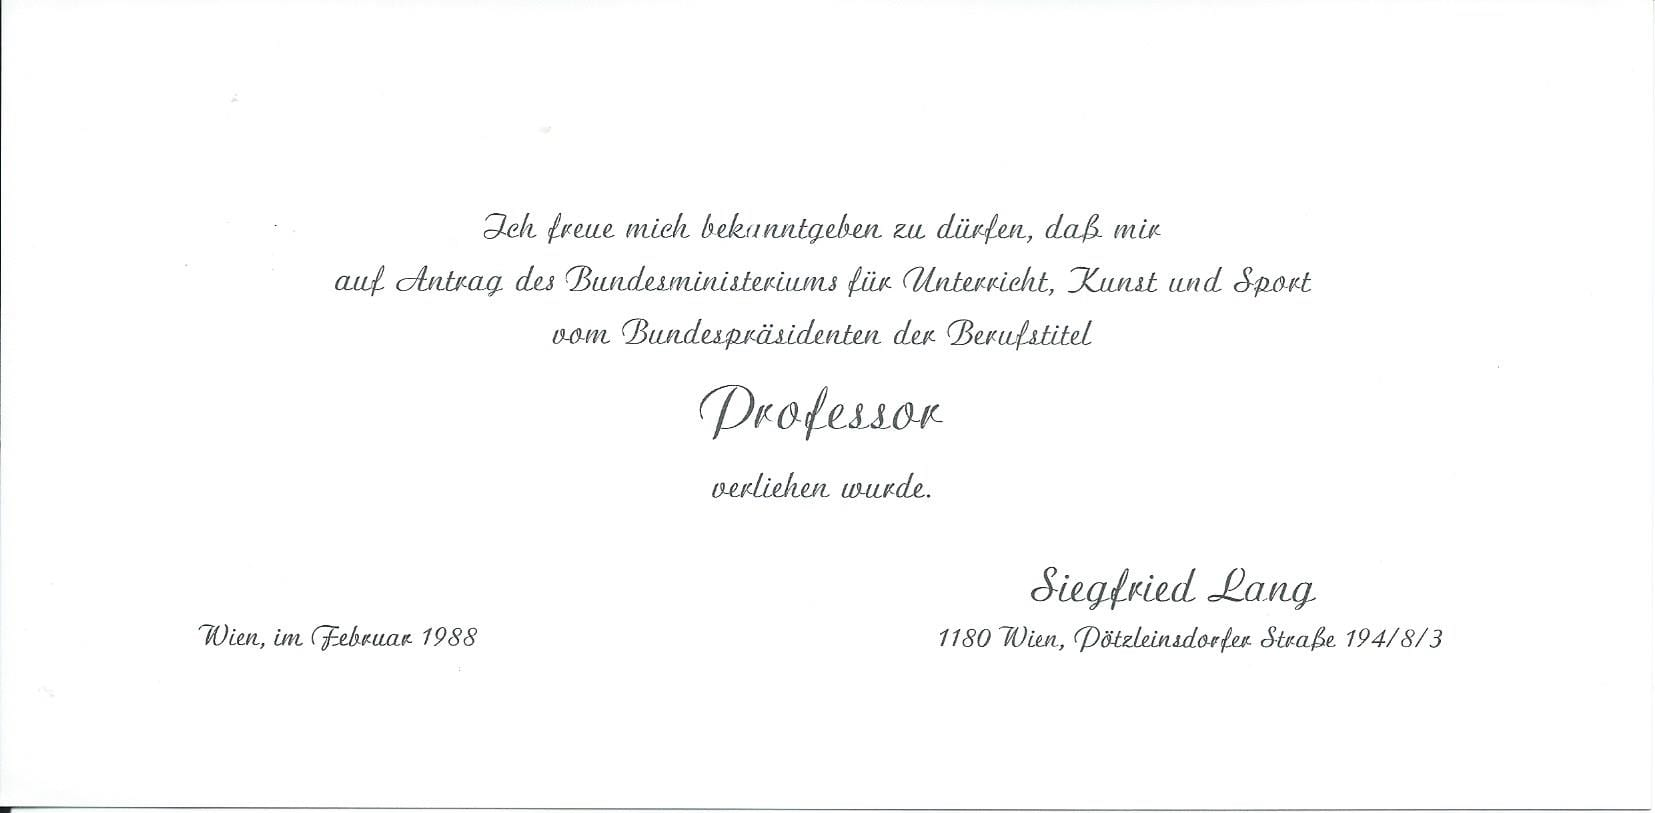 Mitteilung Professor Februar 1988